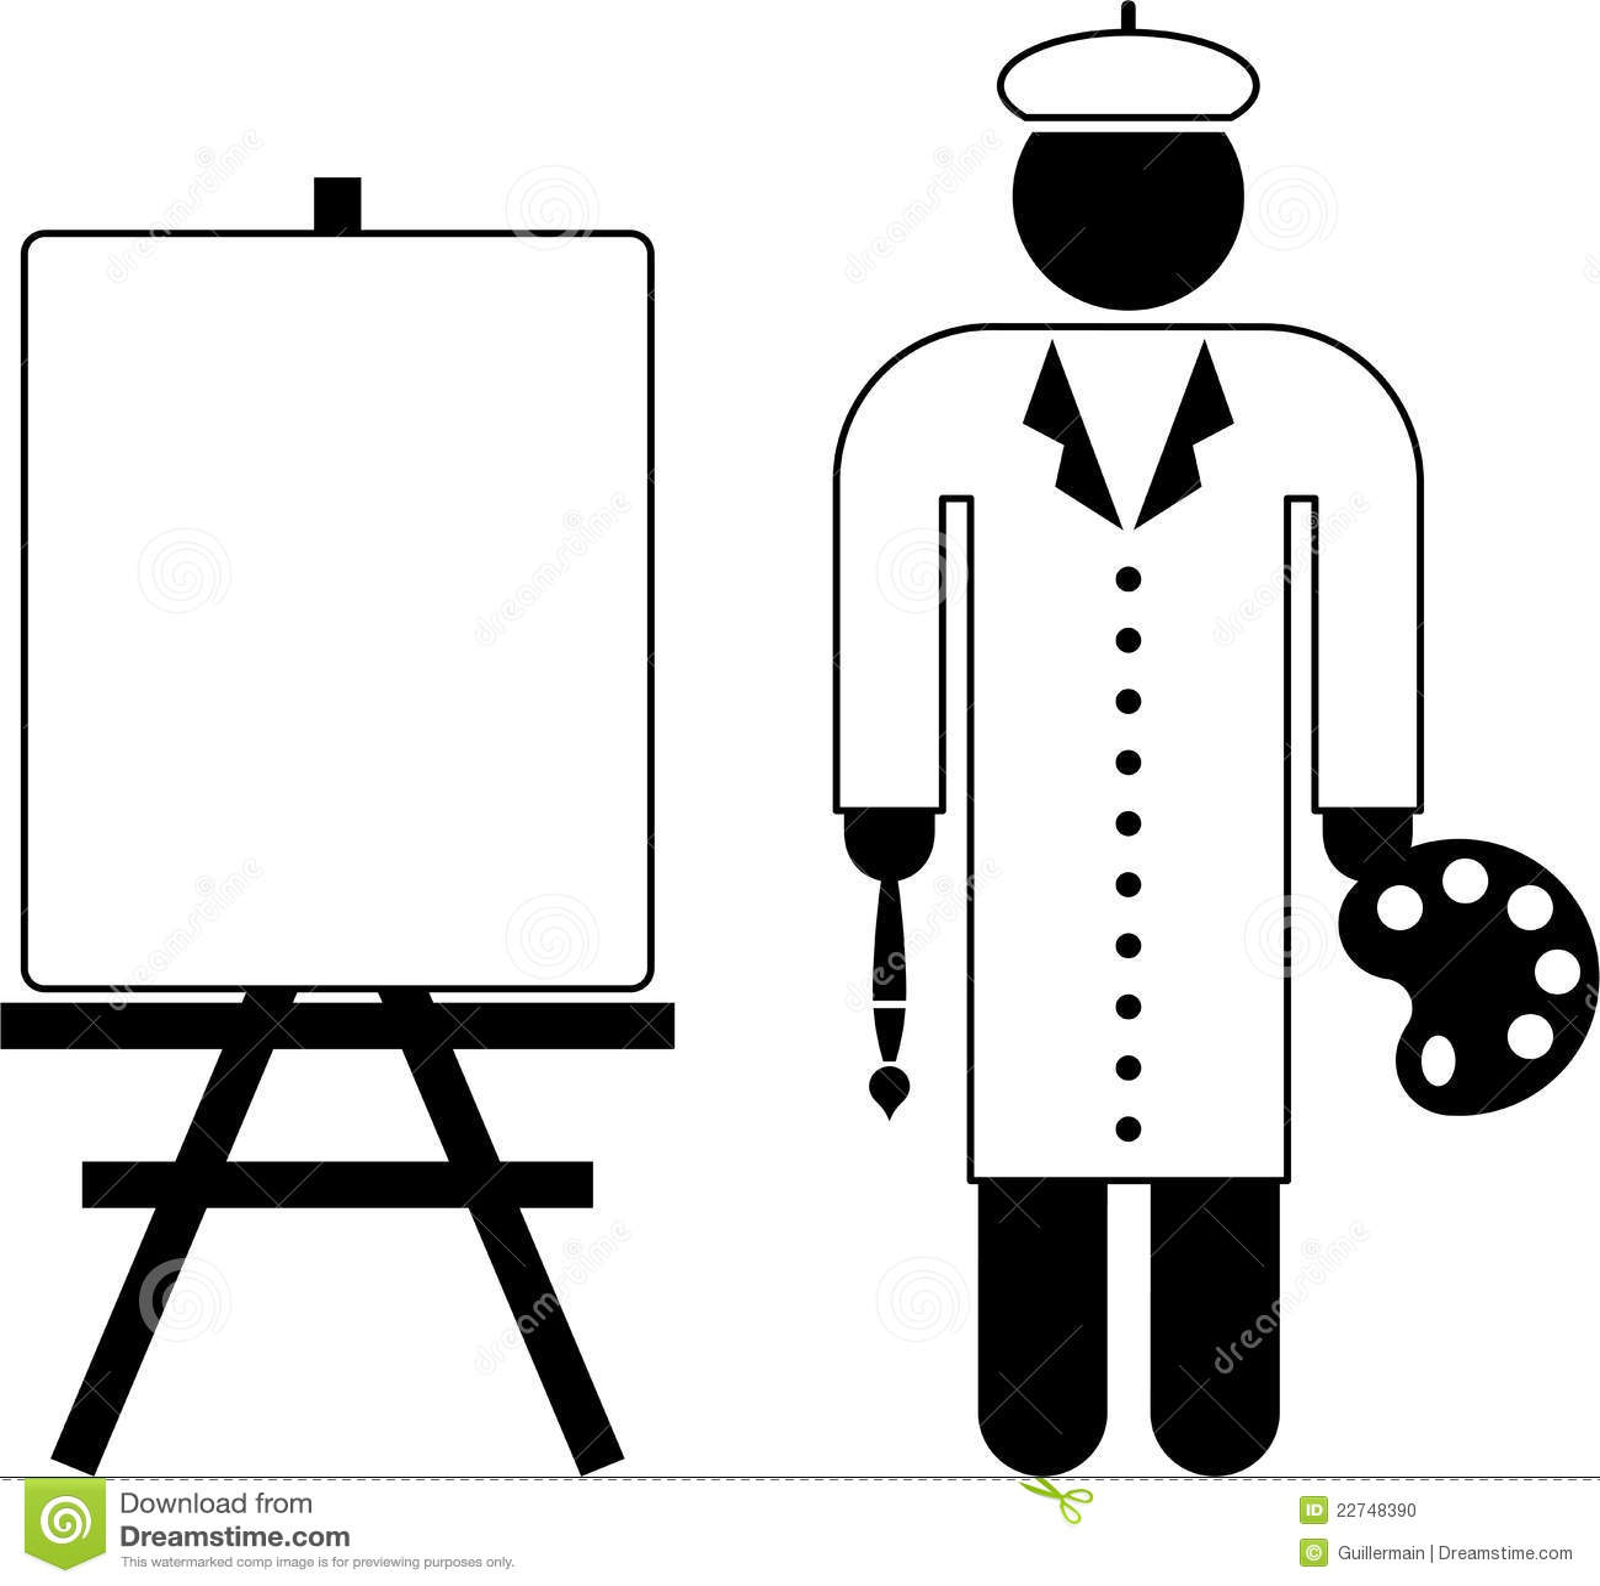 Malerpiktogramm